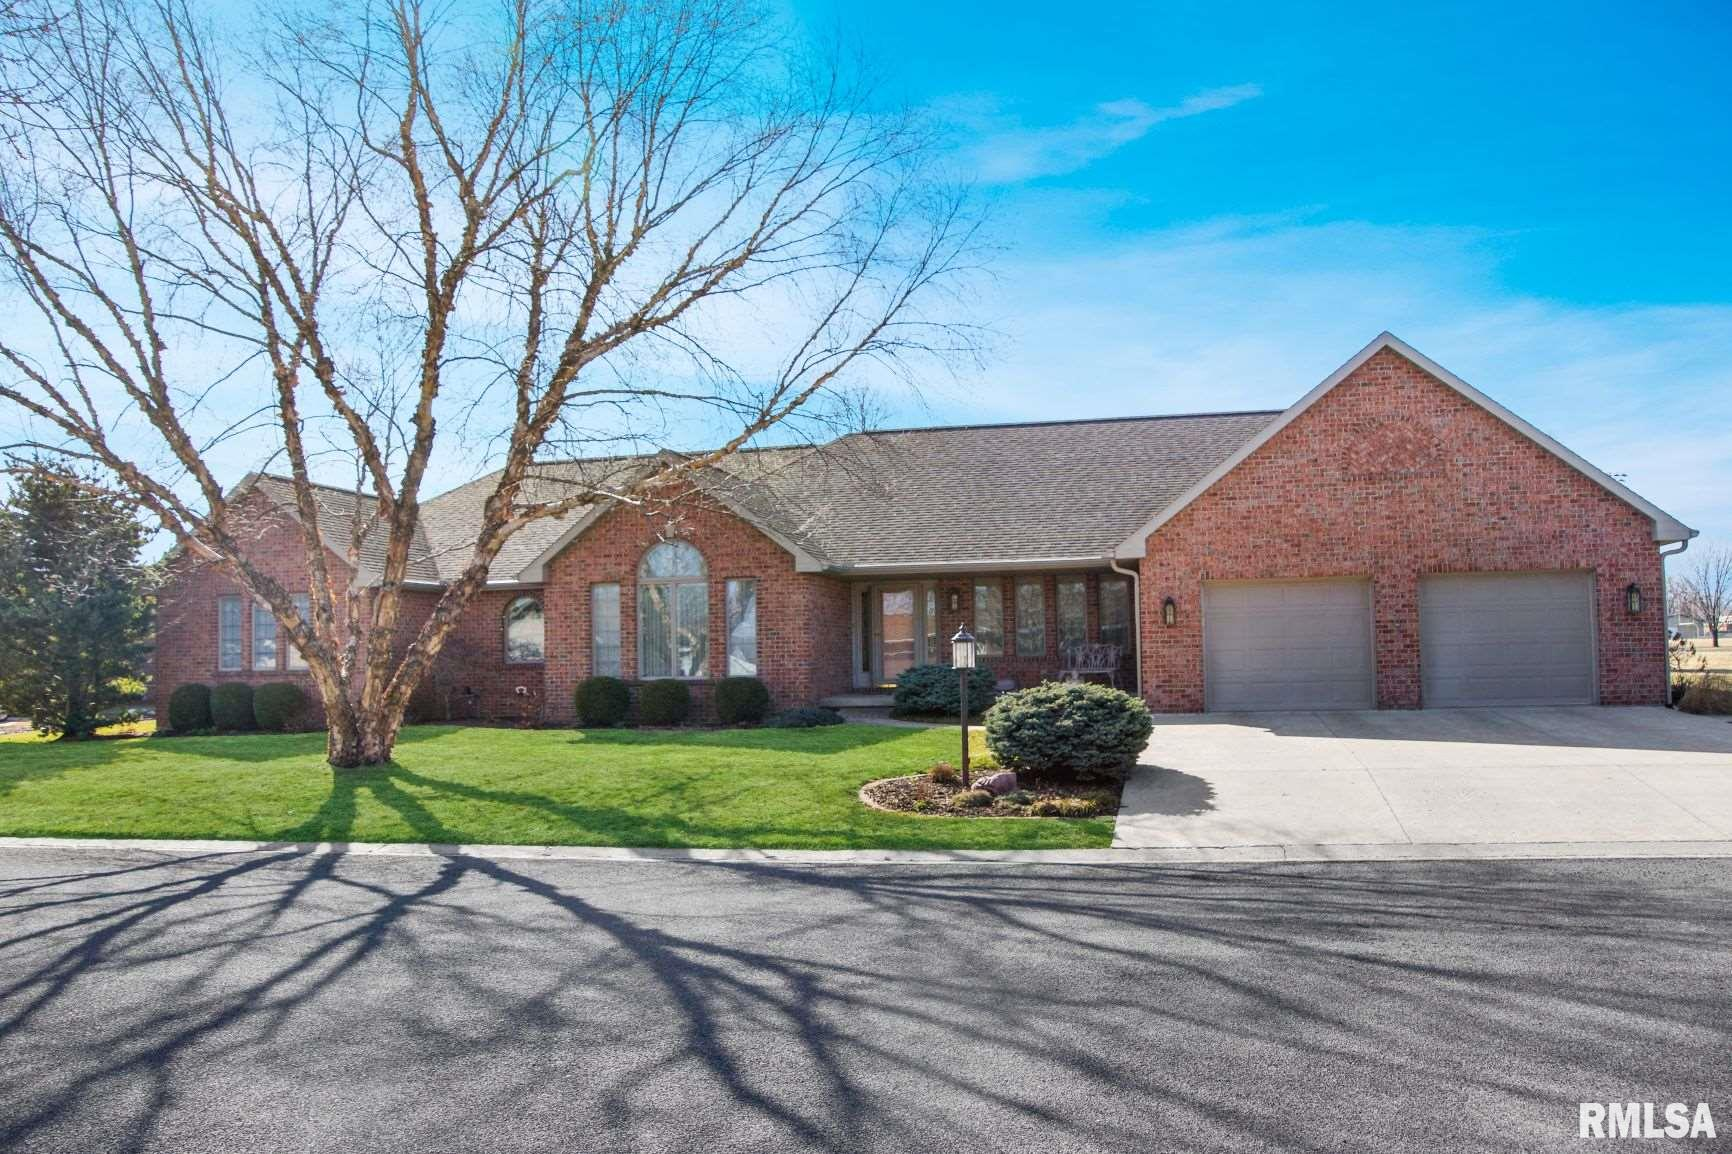 61559 Real Estate Listings Main Image